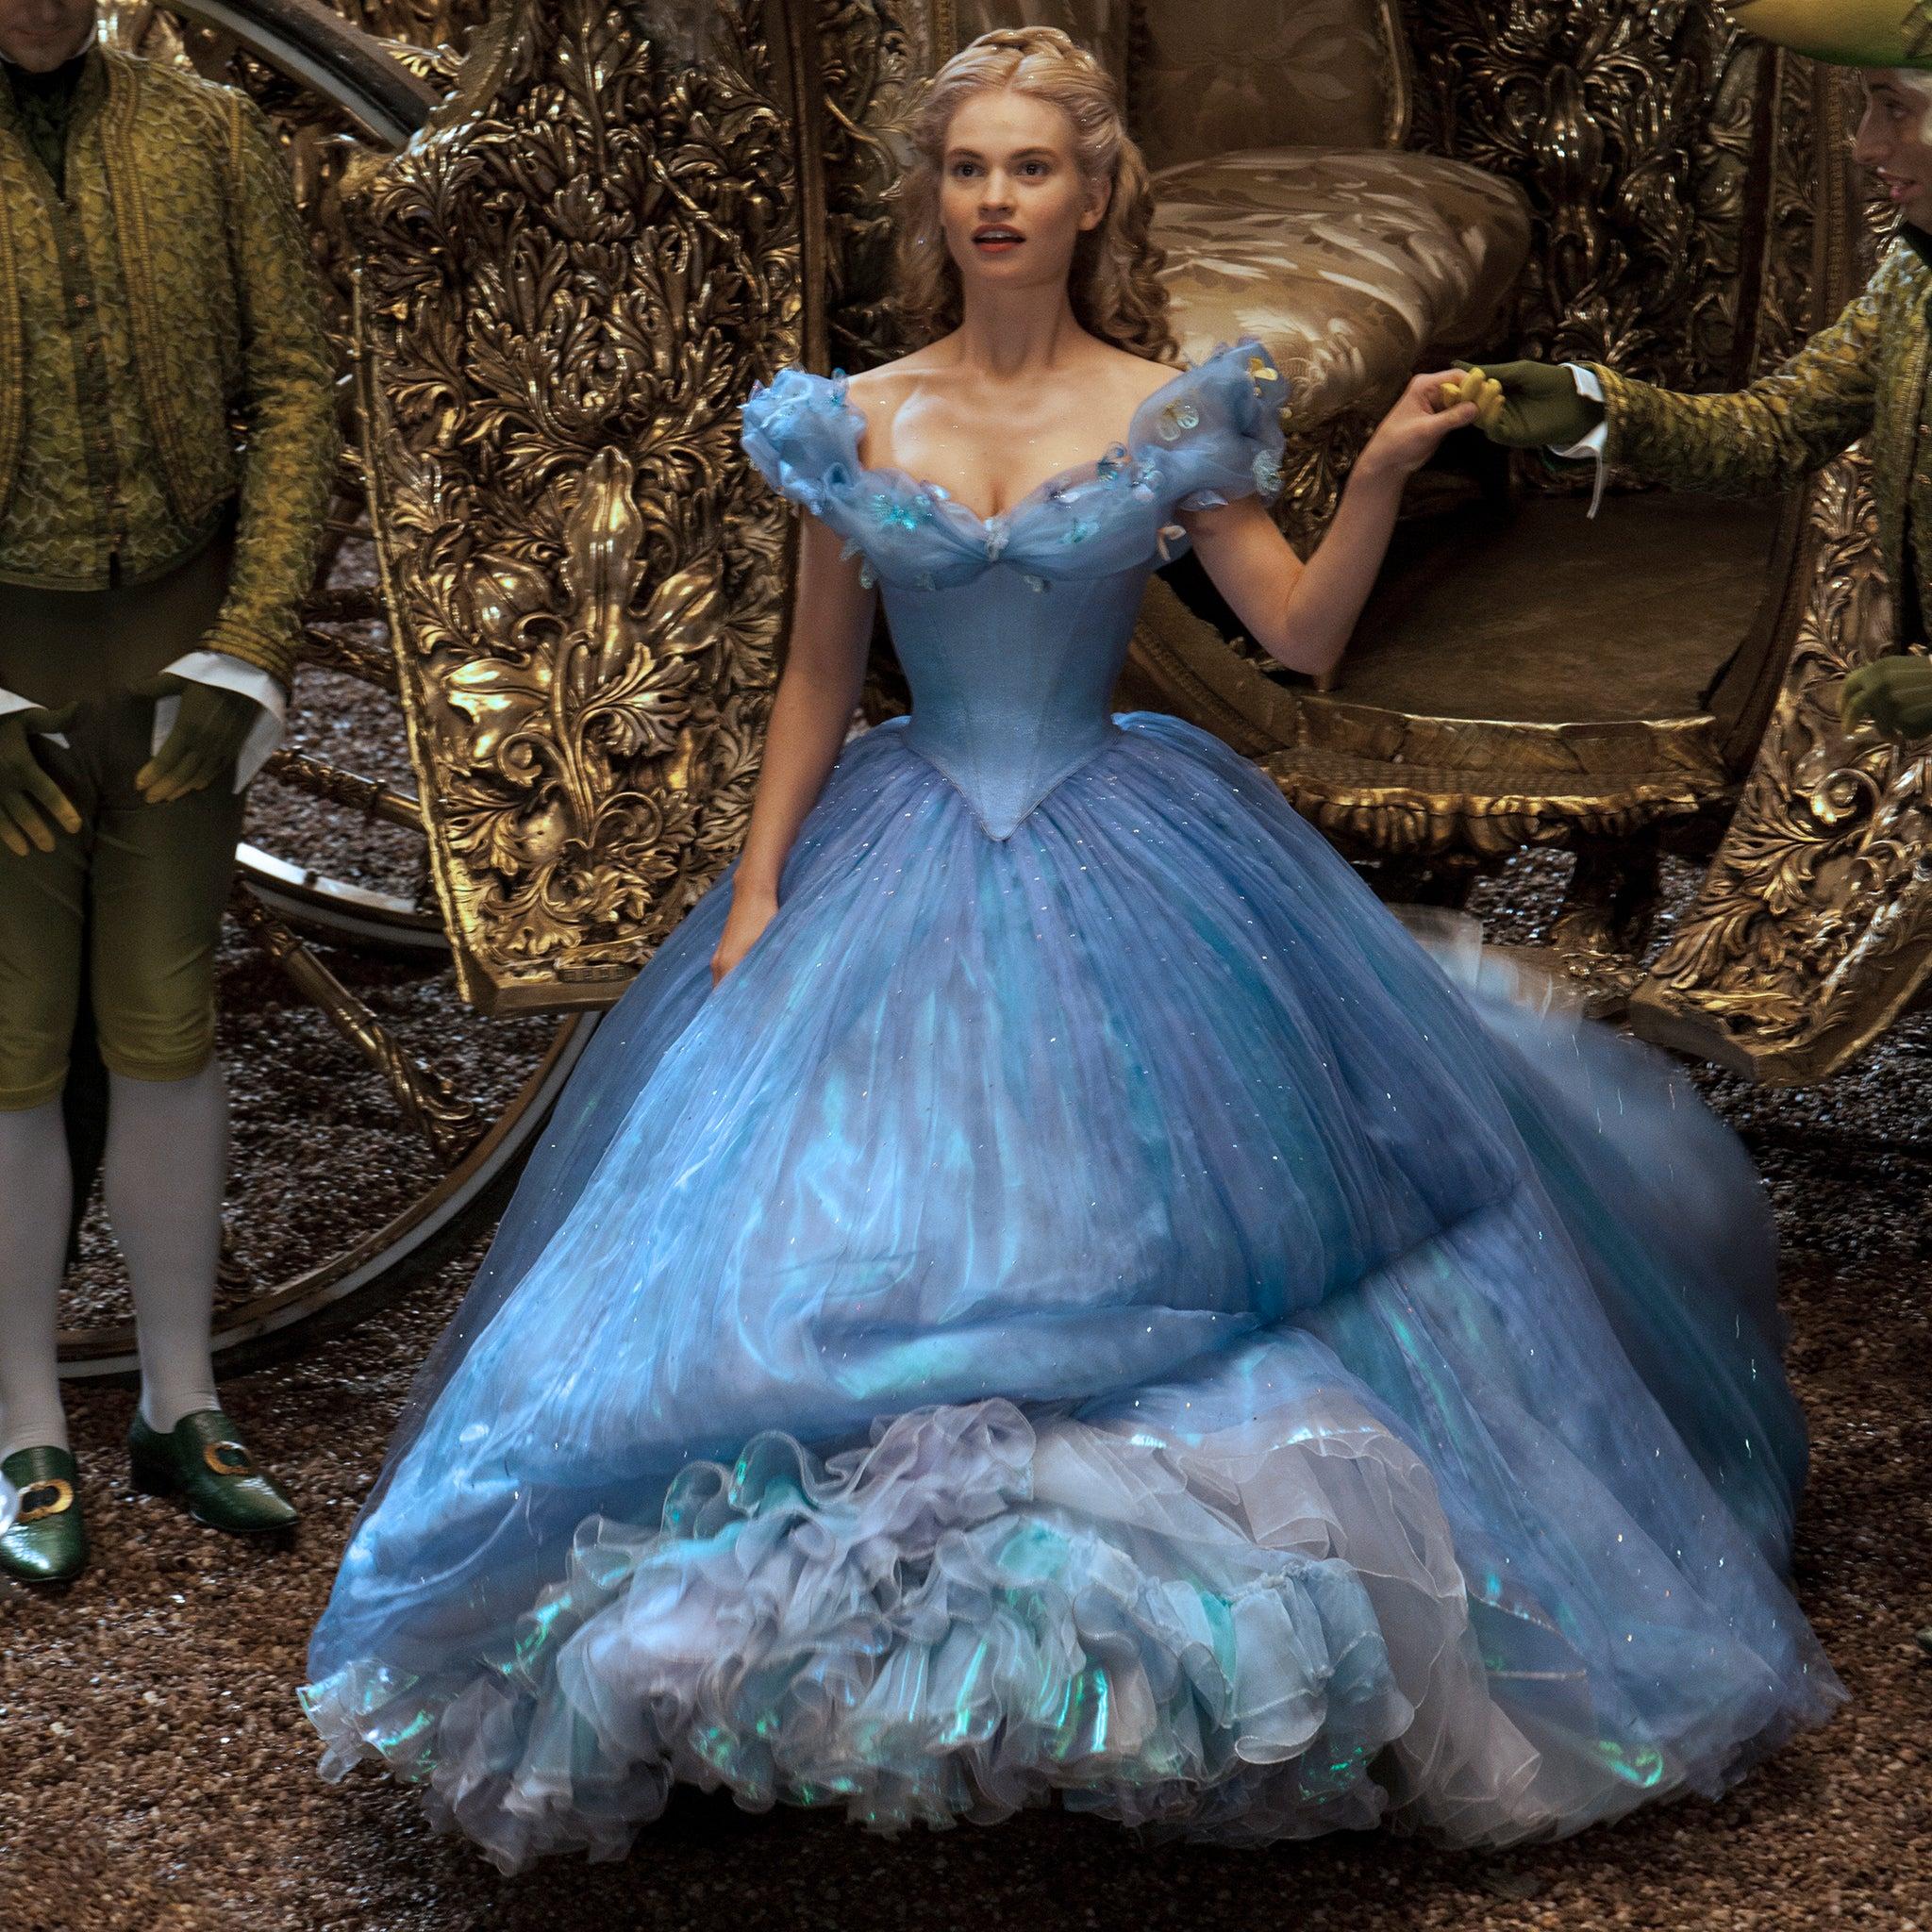 Disneys Cinderella Why Downton Abbey Star Lily James Is